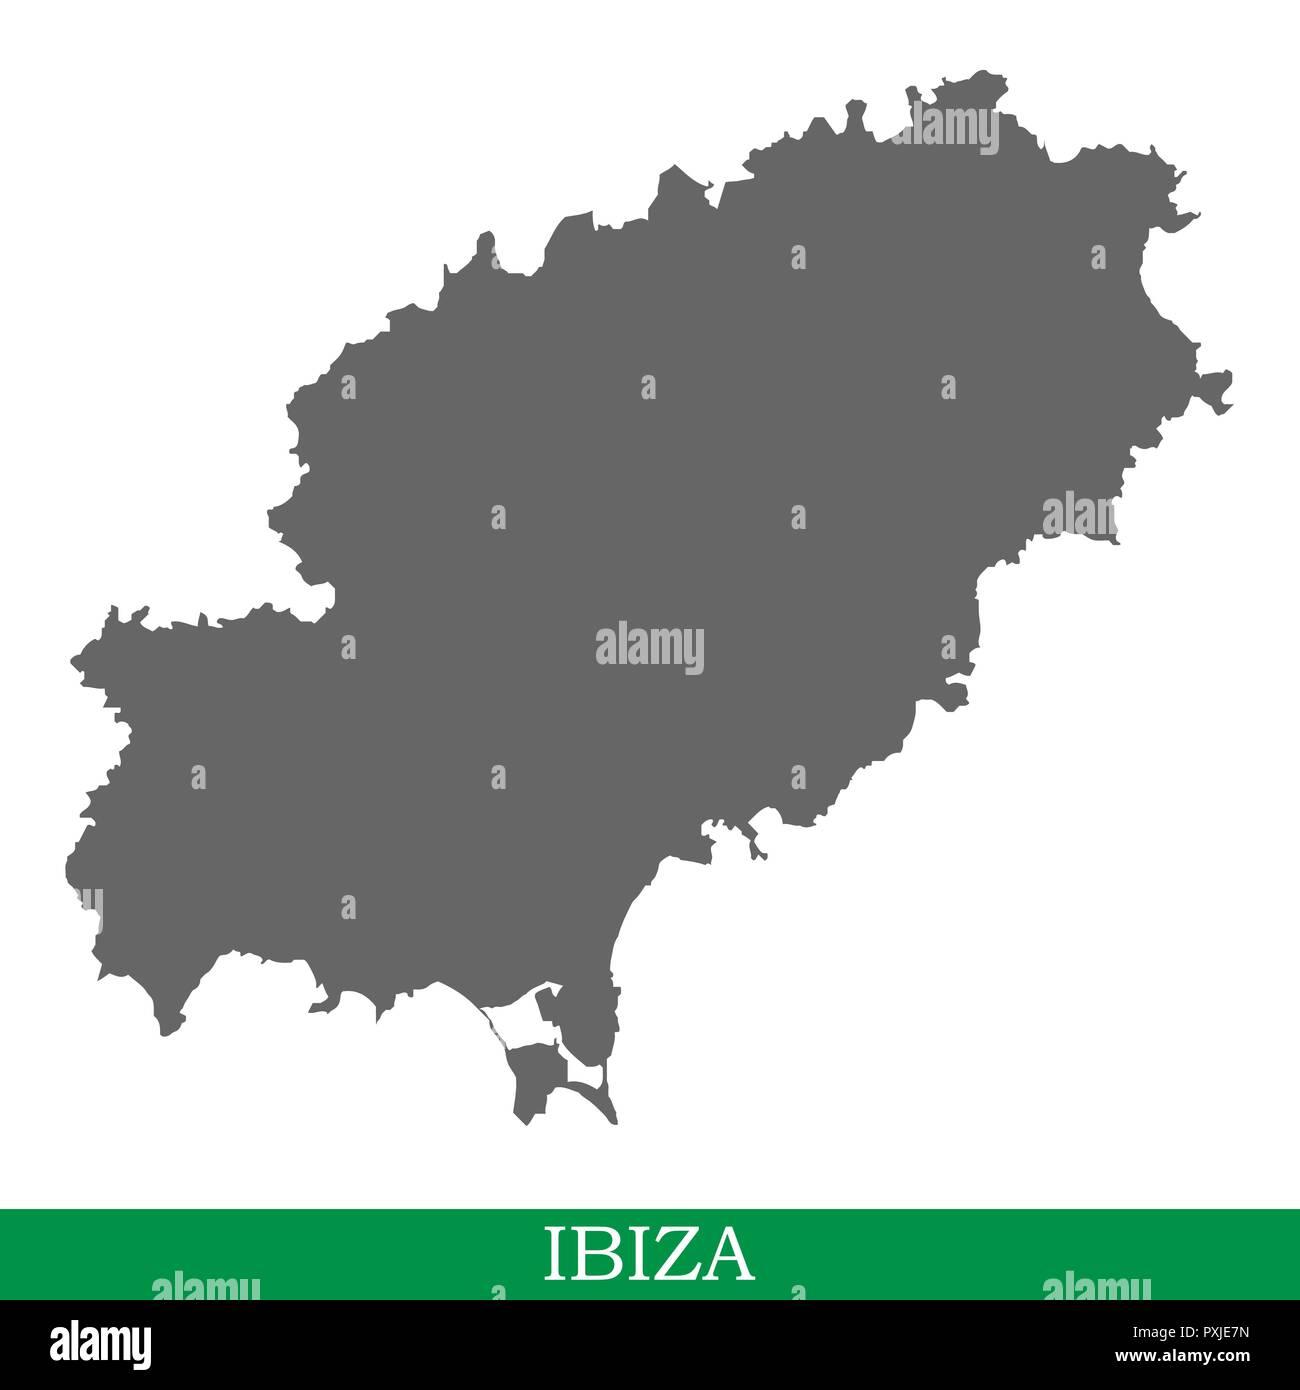 Spagna E Isole Baleari Cartina.Alta Qualita Mappa Di Ibiza E Un Isola Di Spagna Isole Baleari Immagine E Vettoriale Alamy